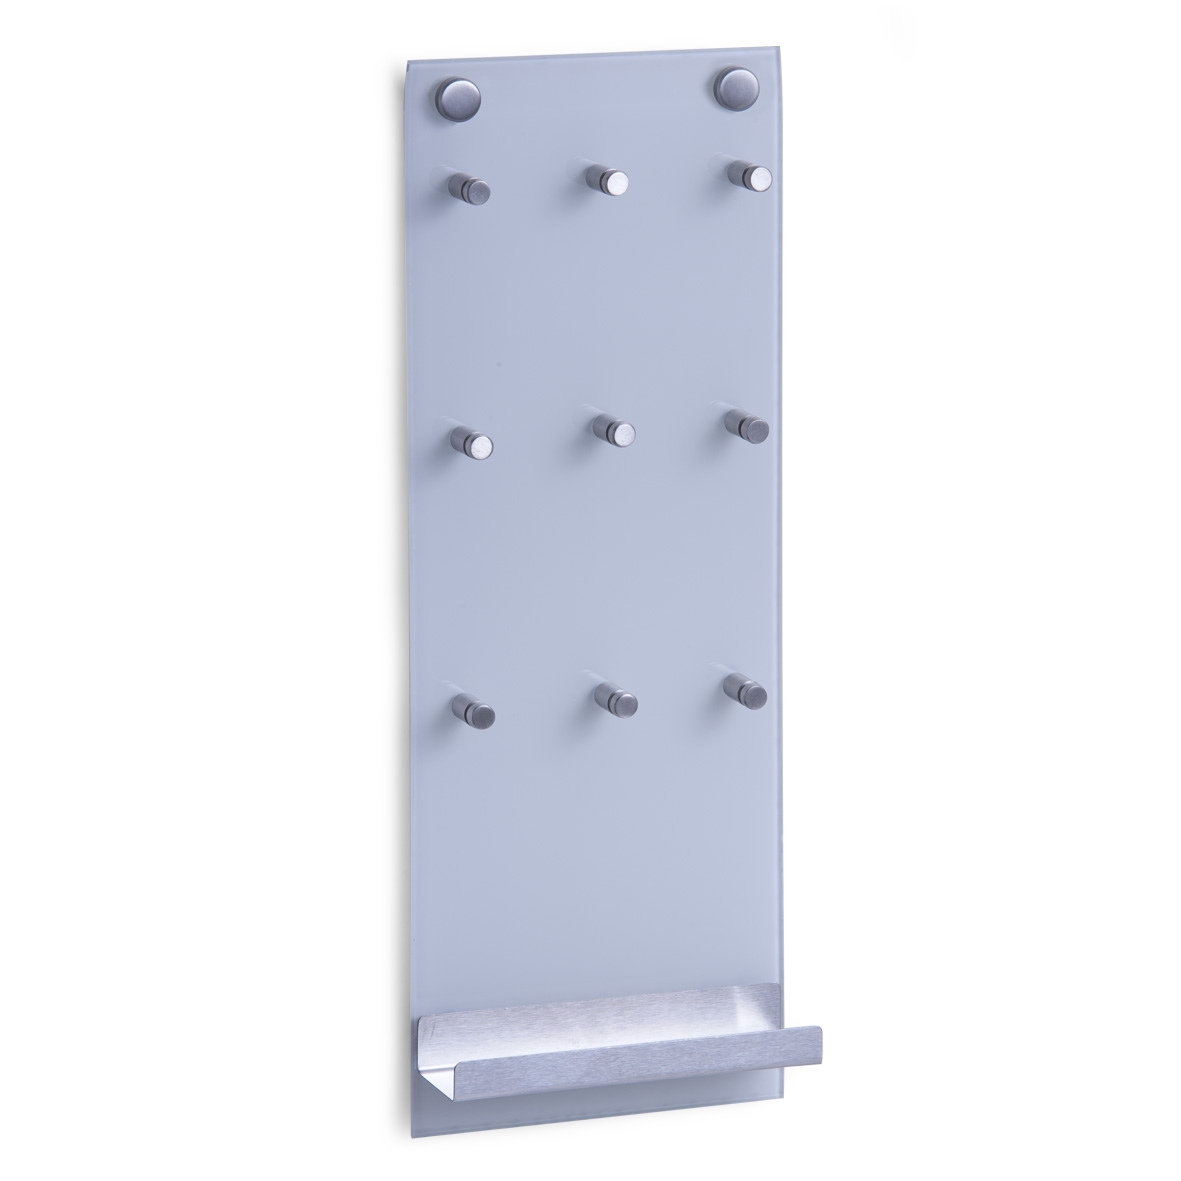 Suport pentru chei Satin Glass l15xH40 cm